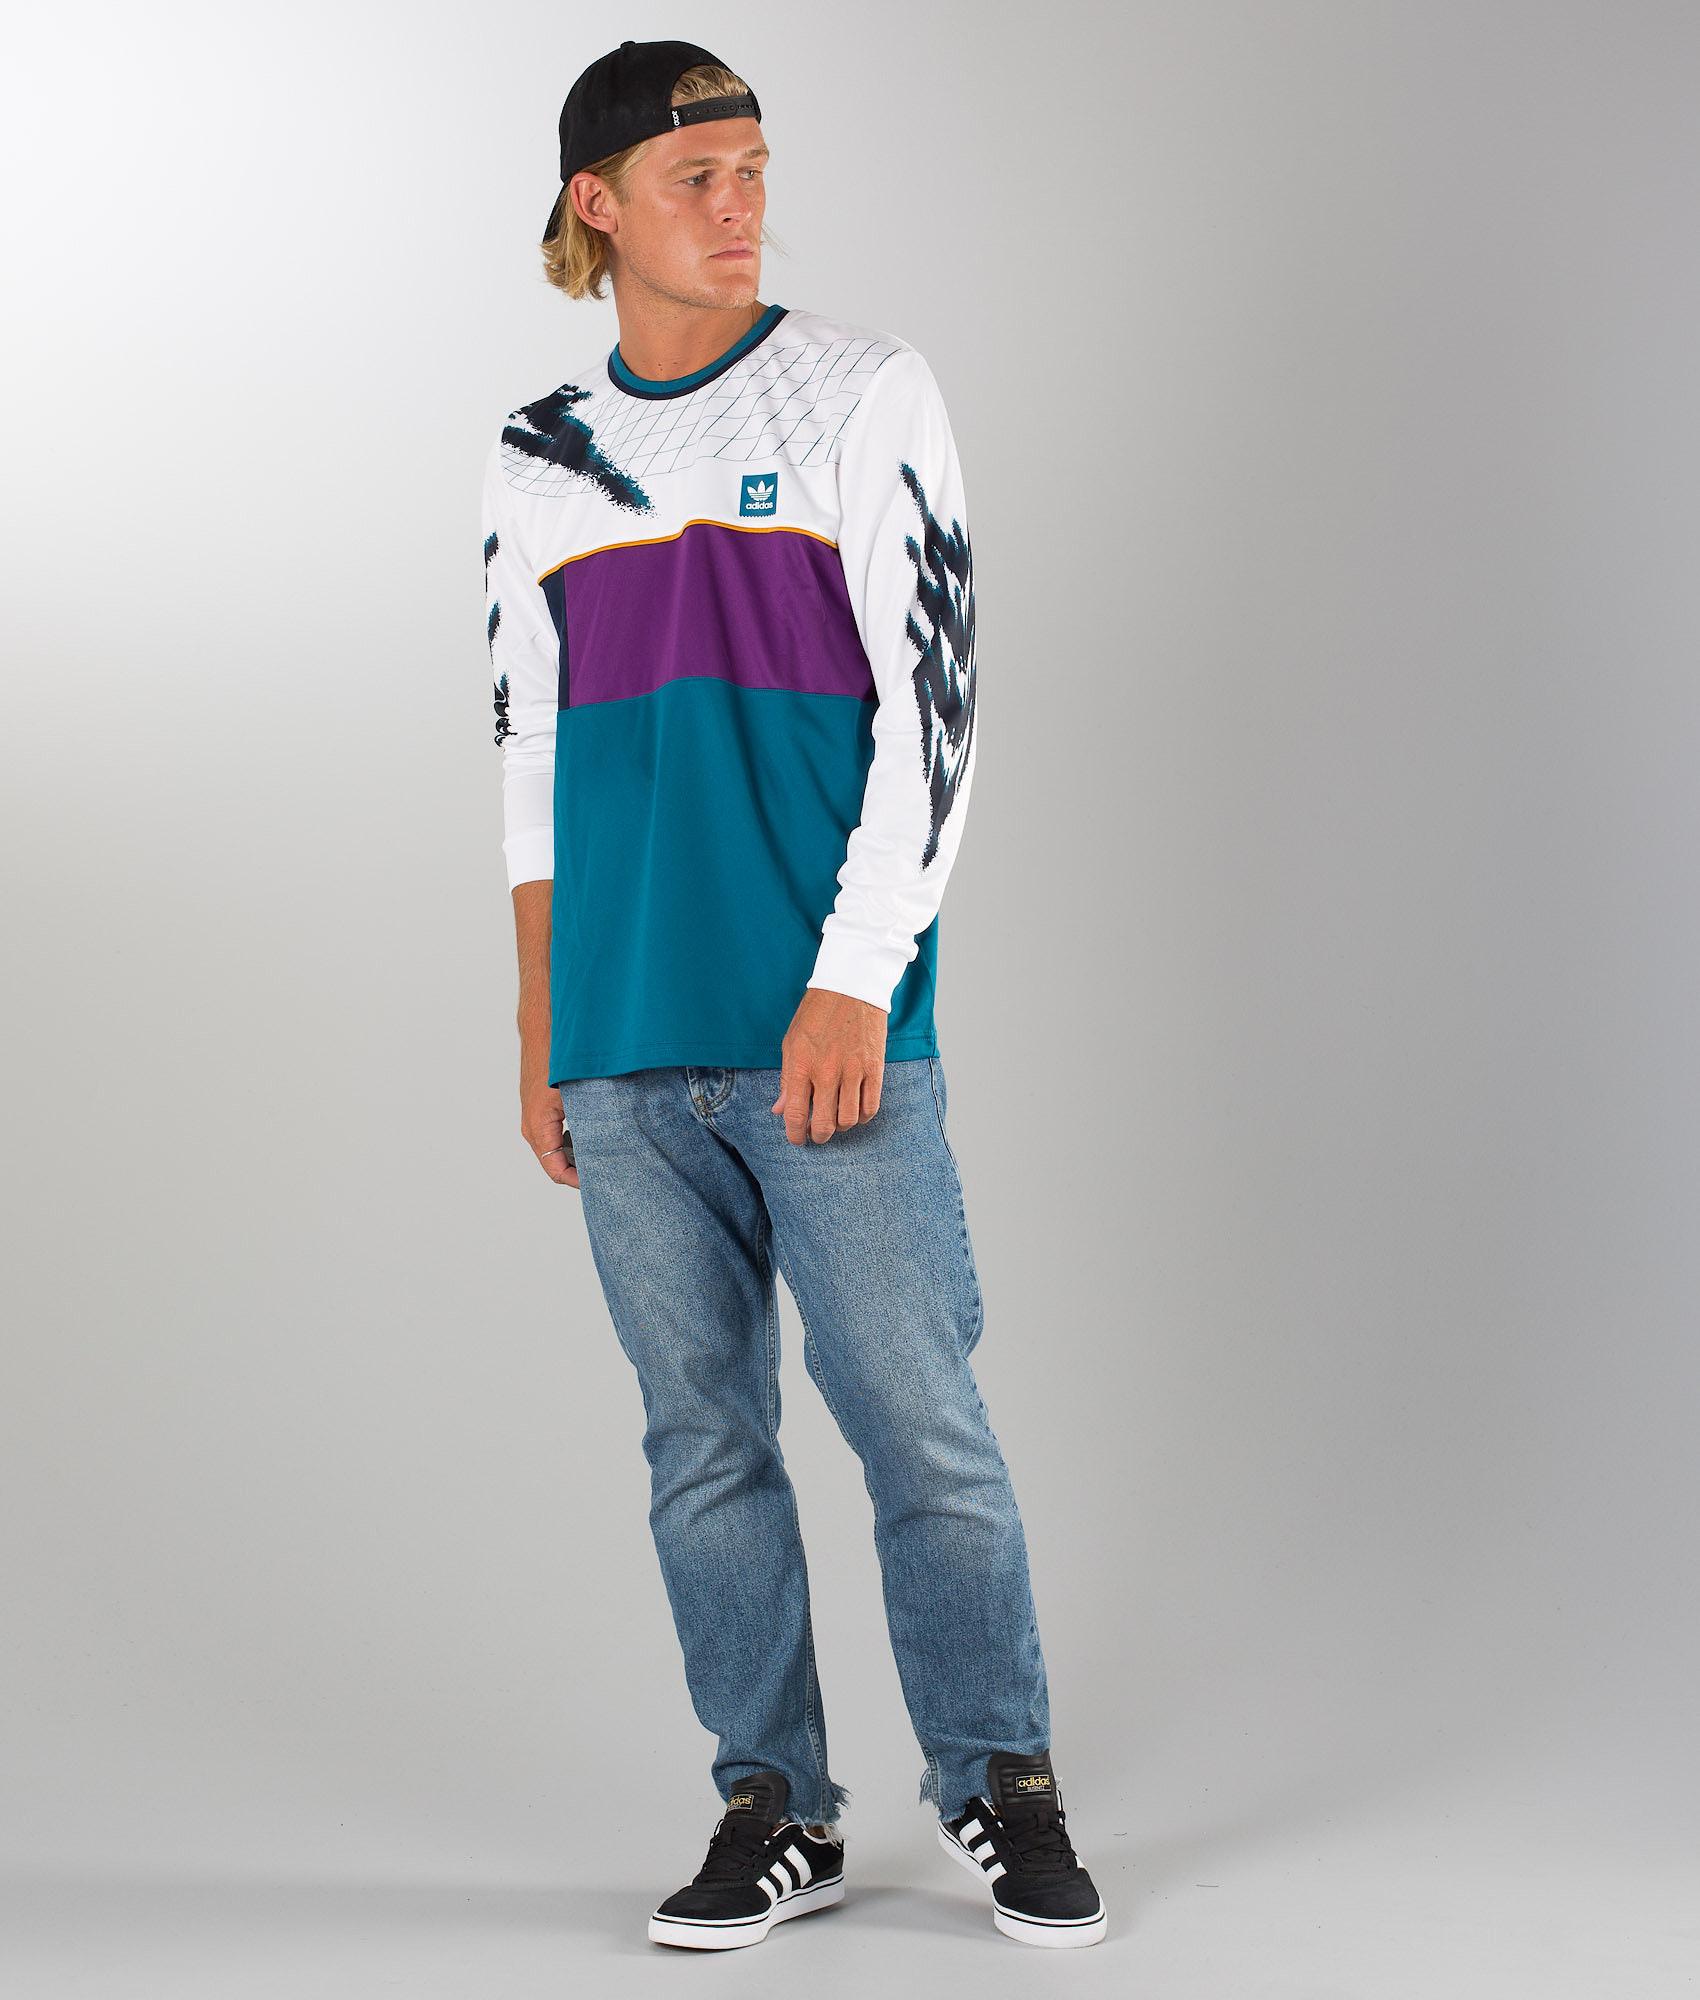 separation shoes a672e 1c5fa Adidas Skateboarding Tennisjersey T-shirt